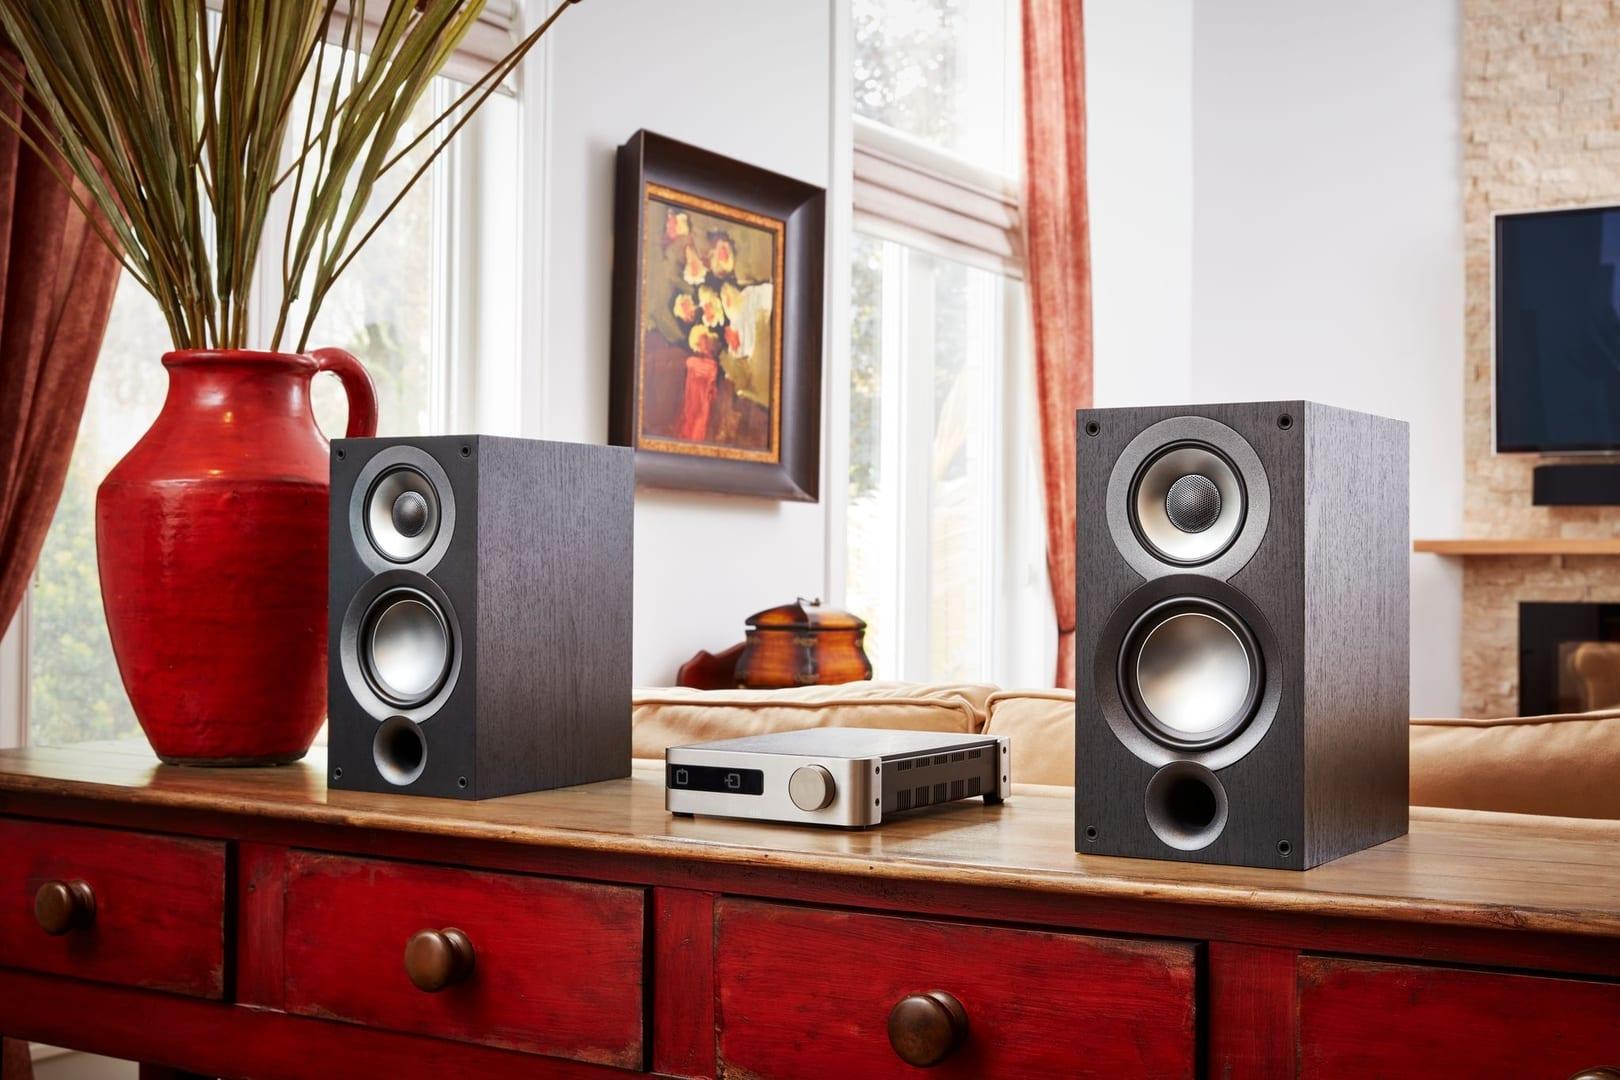 ELAC Announces the Uni-Fi 2.0 Line of Home Speakers